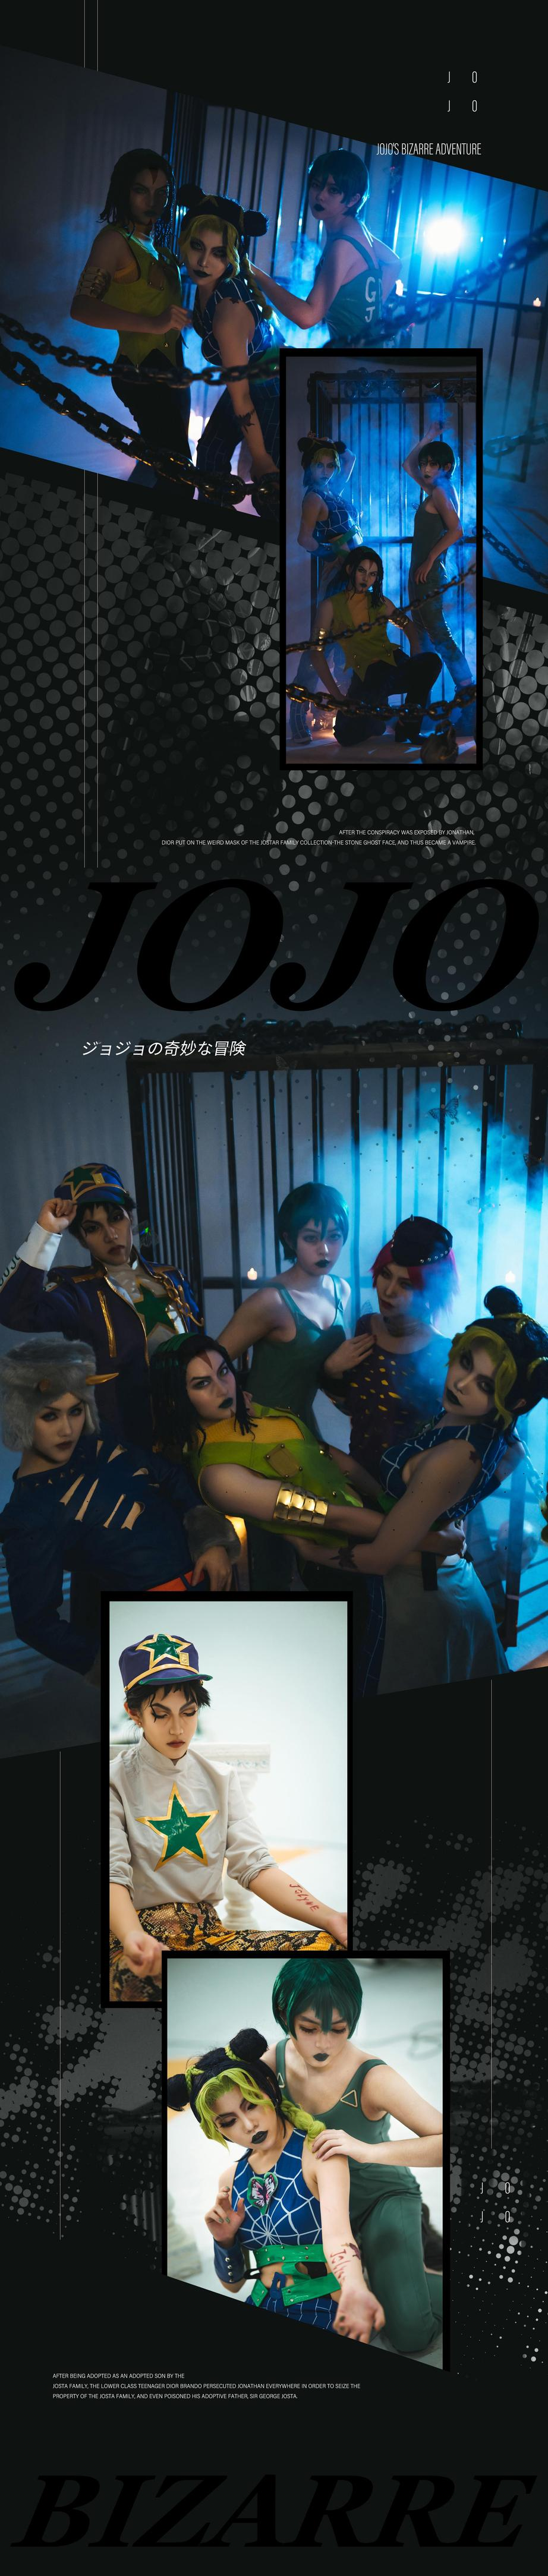 《JOJO的奇妙冒险》正片cosplay【CN:H-尚】-第4张